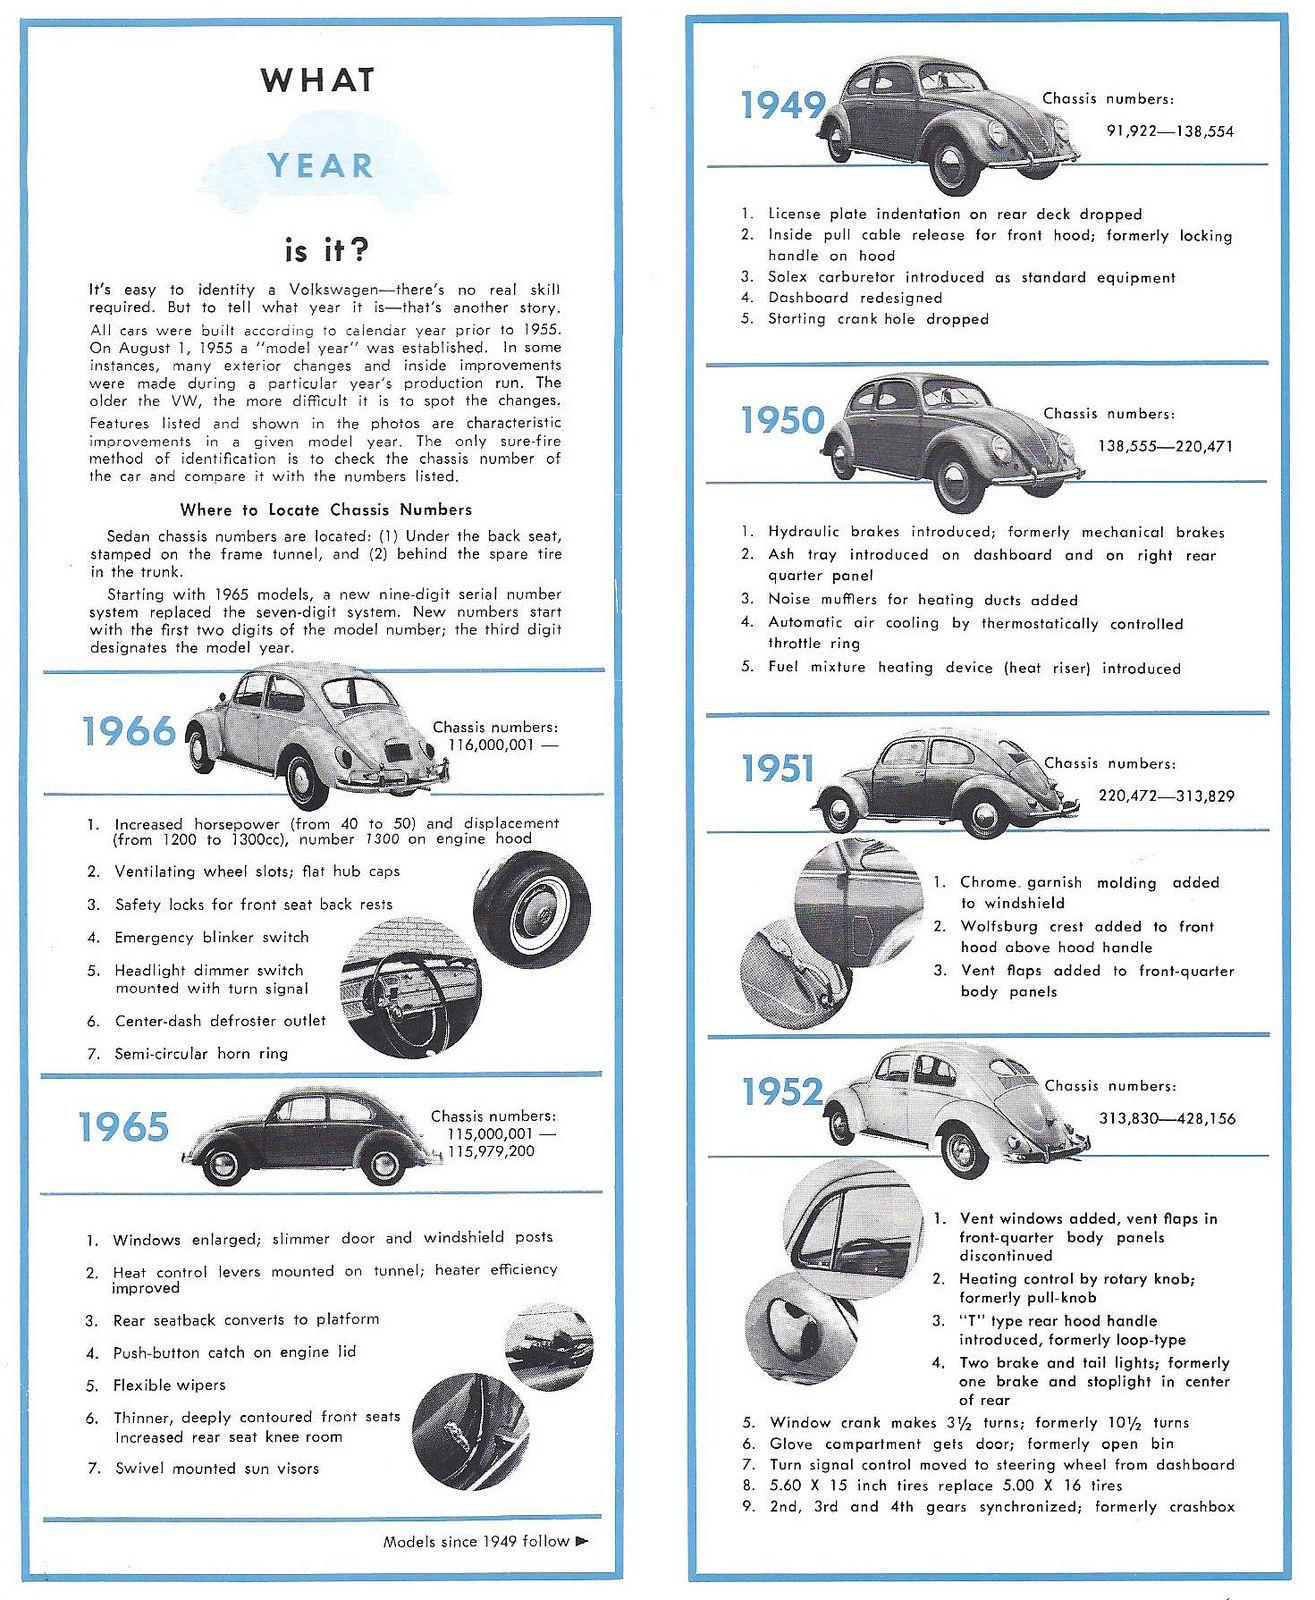 What Year Is It Vintage Volkswagen What Year Is It Classic Volkswagen